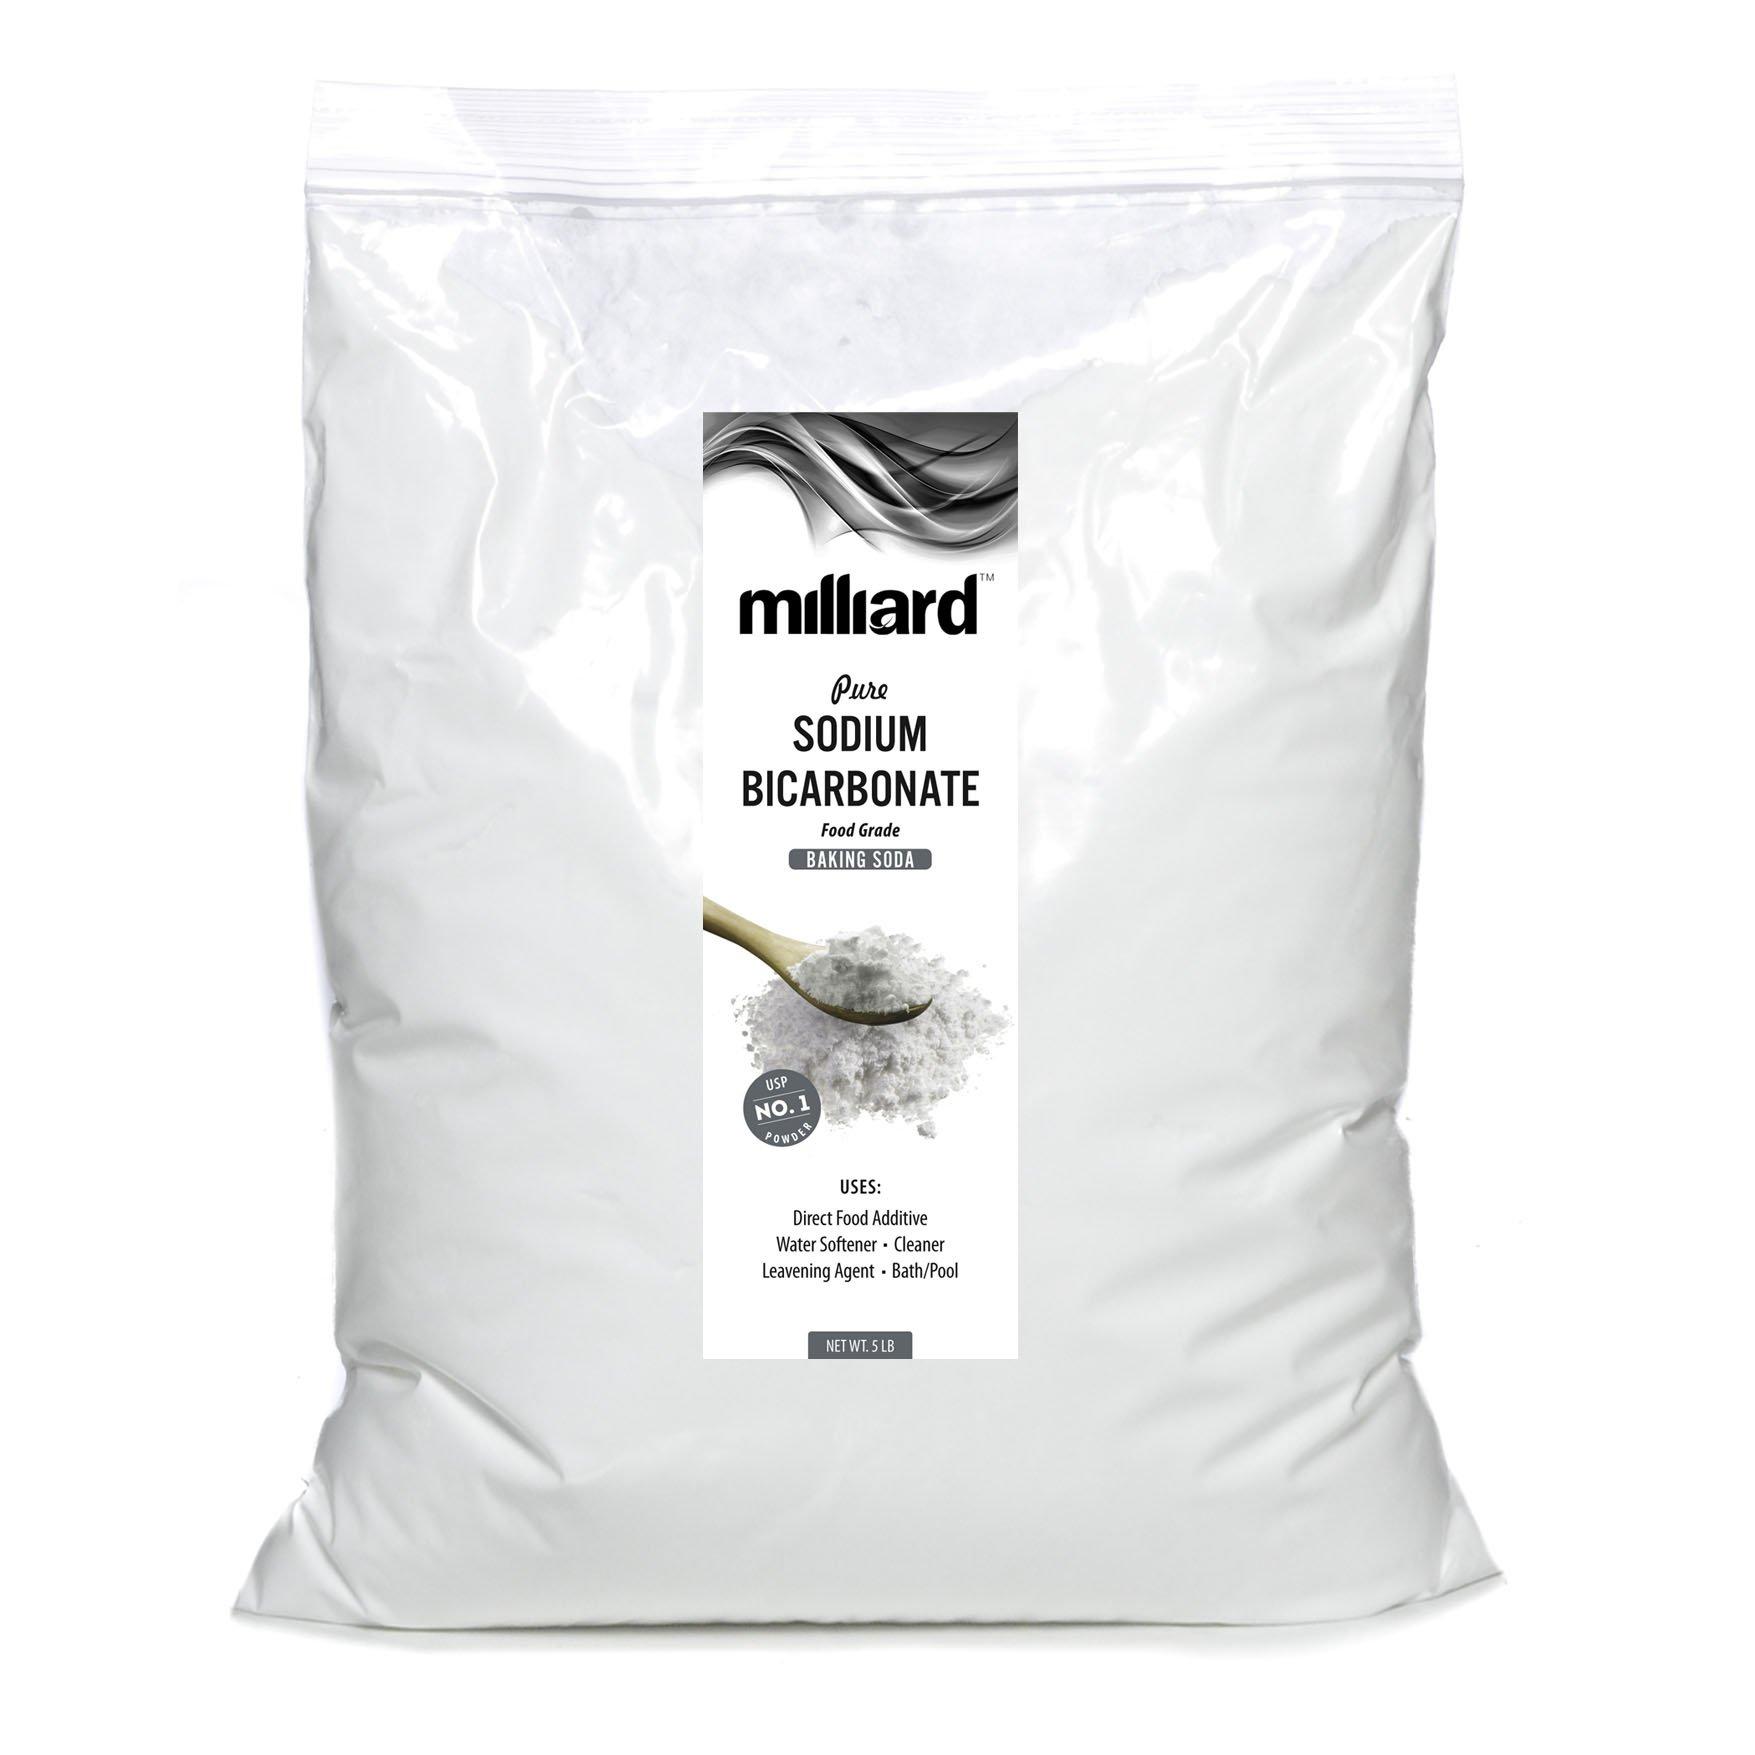 Milliard Sodium Bicarbonate USP - 5 Pound Bulk Resealable Bag (AKA Baking Soda/Bicarbonate of Soda)